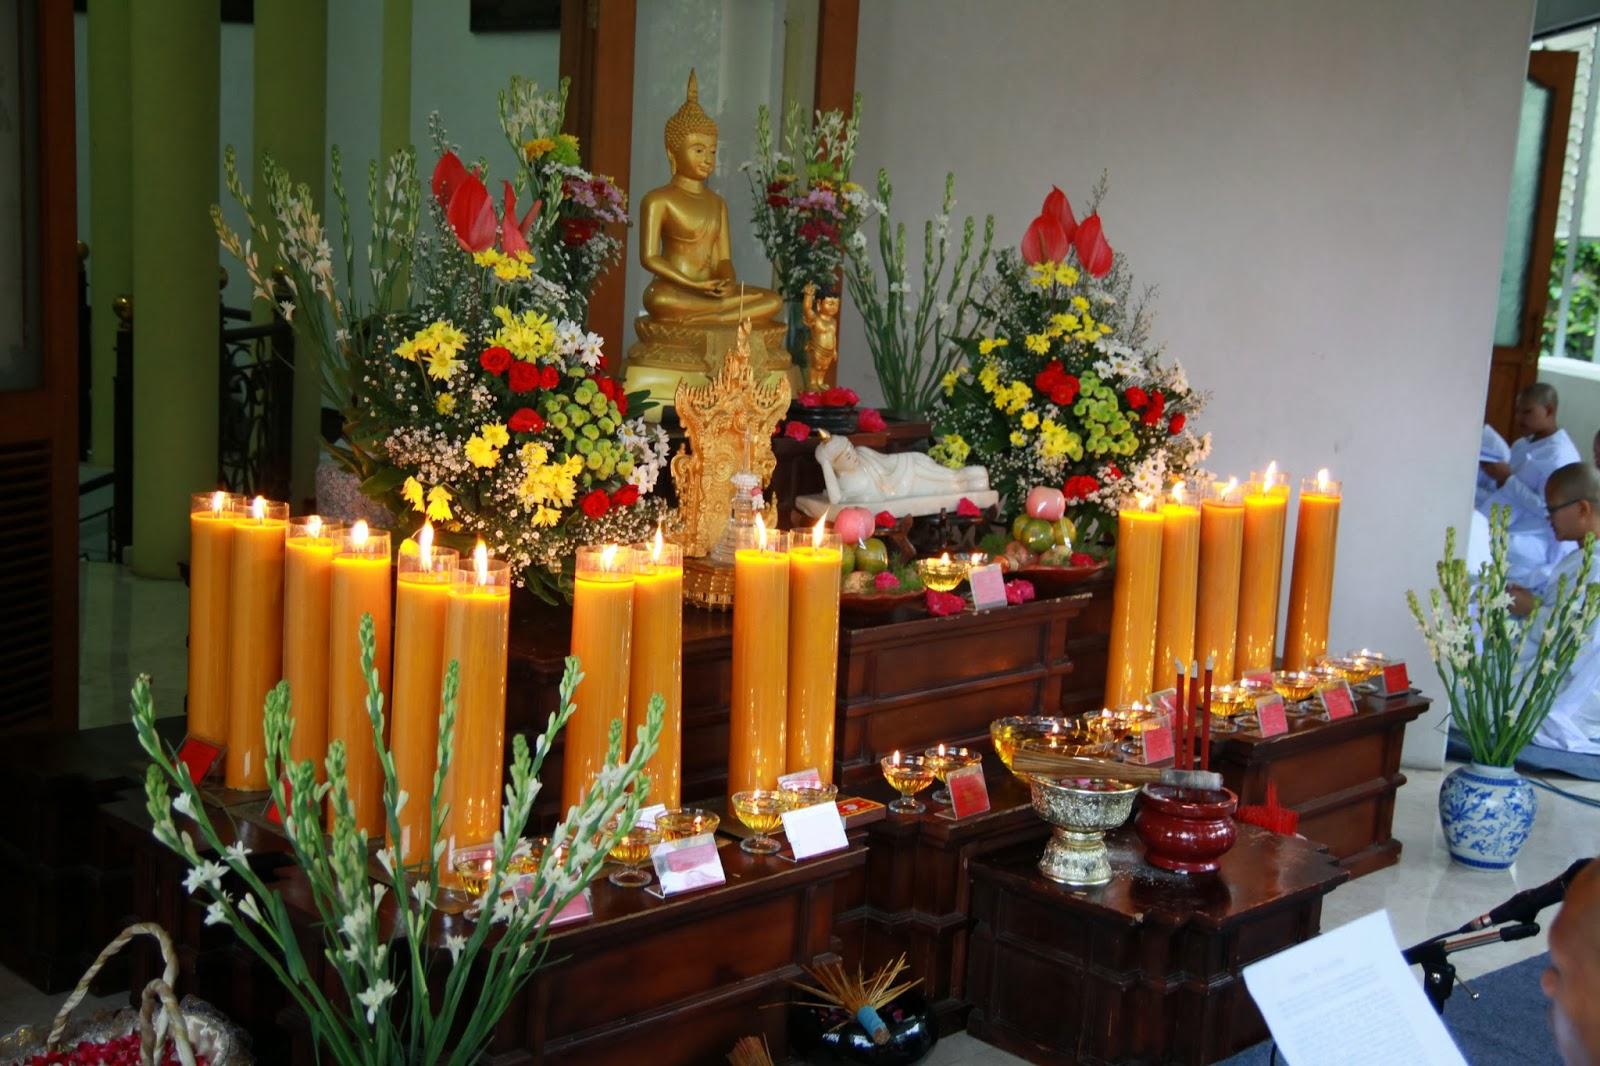 http://buddhist-images.blogspot.com/